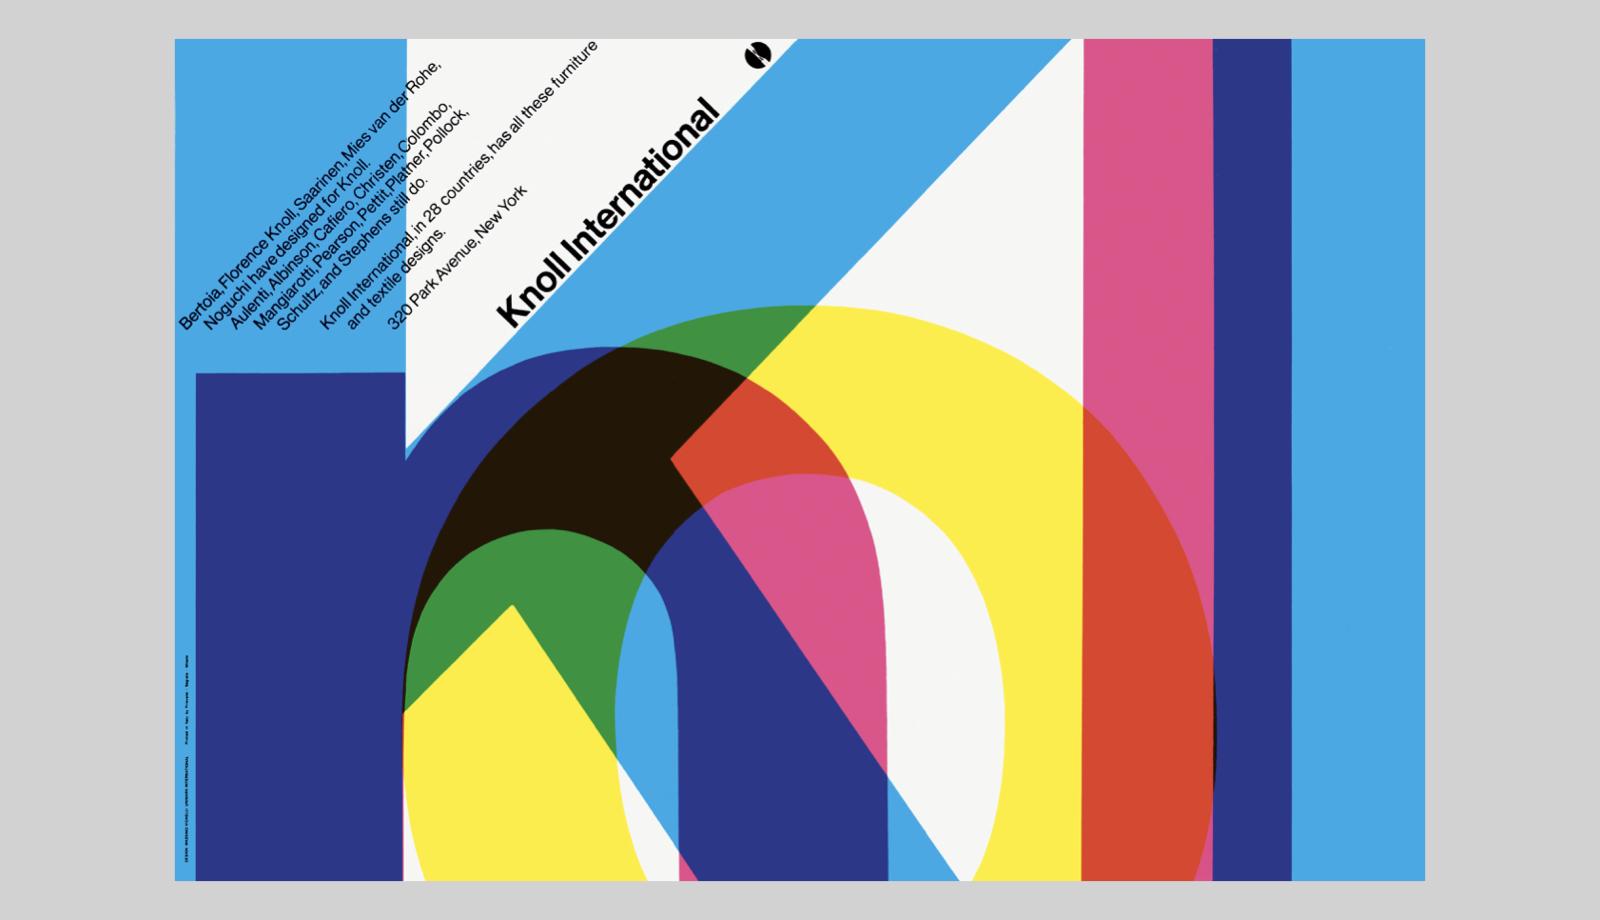 181005_Designkritik_ReneSpitz_WDR3-Mosaik_JensMueller_Grafikdesign1960-heute_1